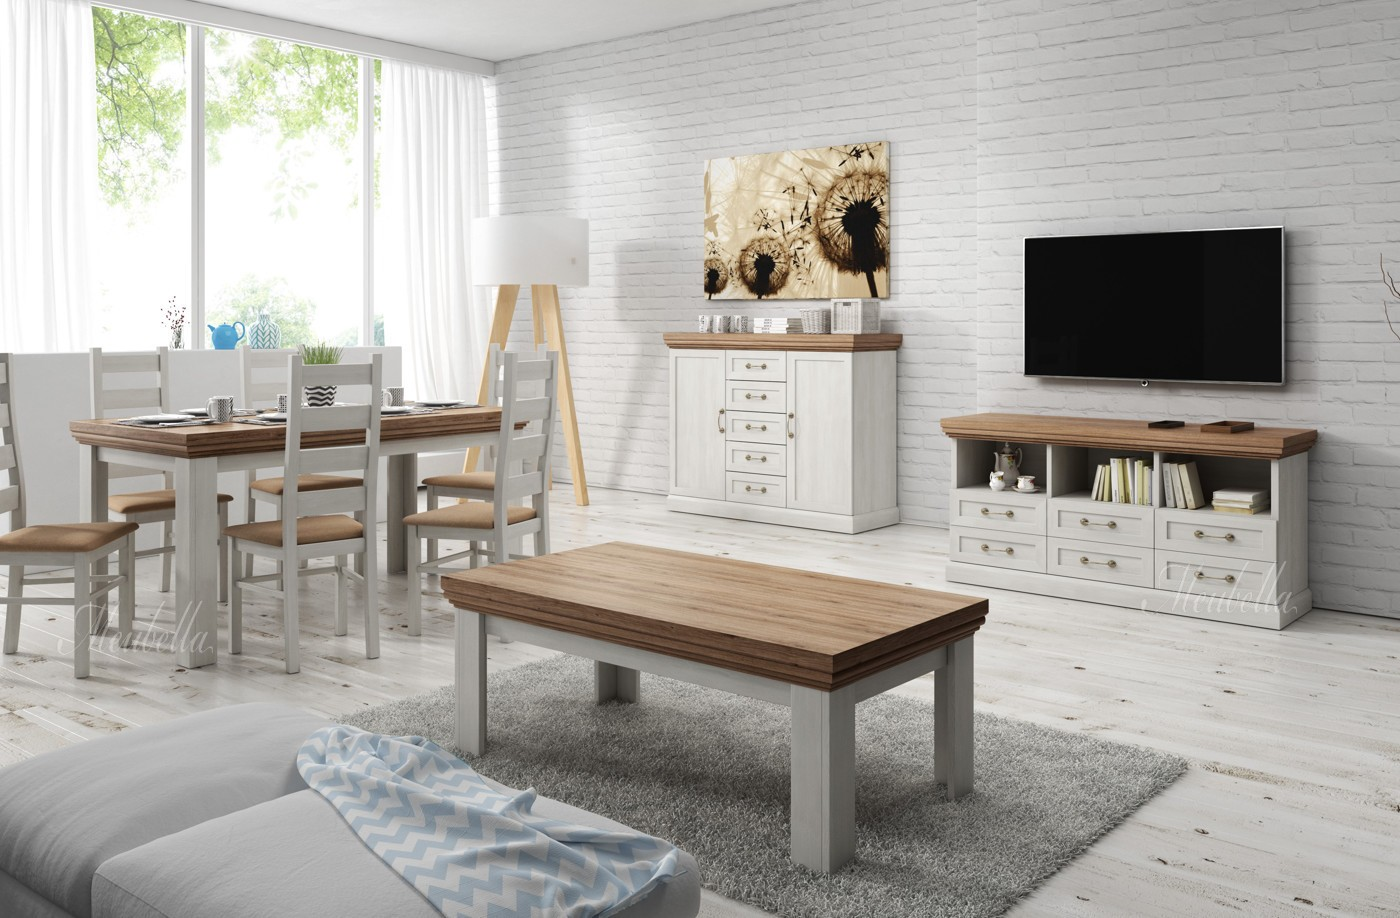 Woonkamer river wit licht eiken 2 meubella for Complete woonkamer meubels